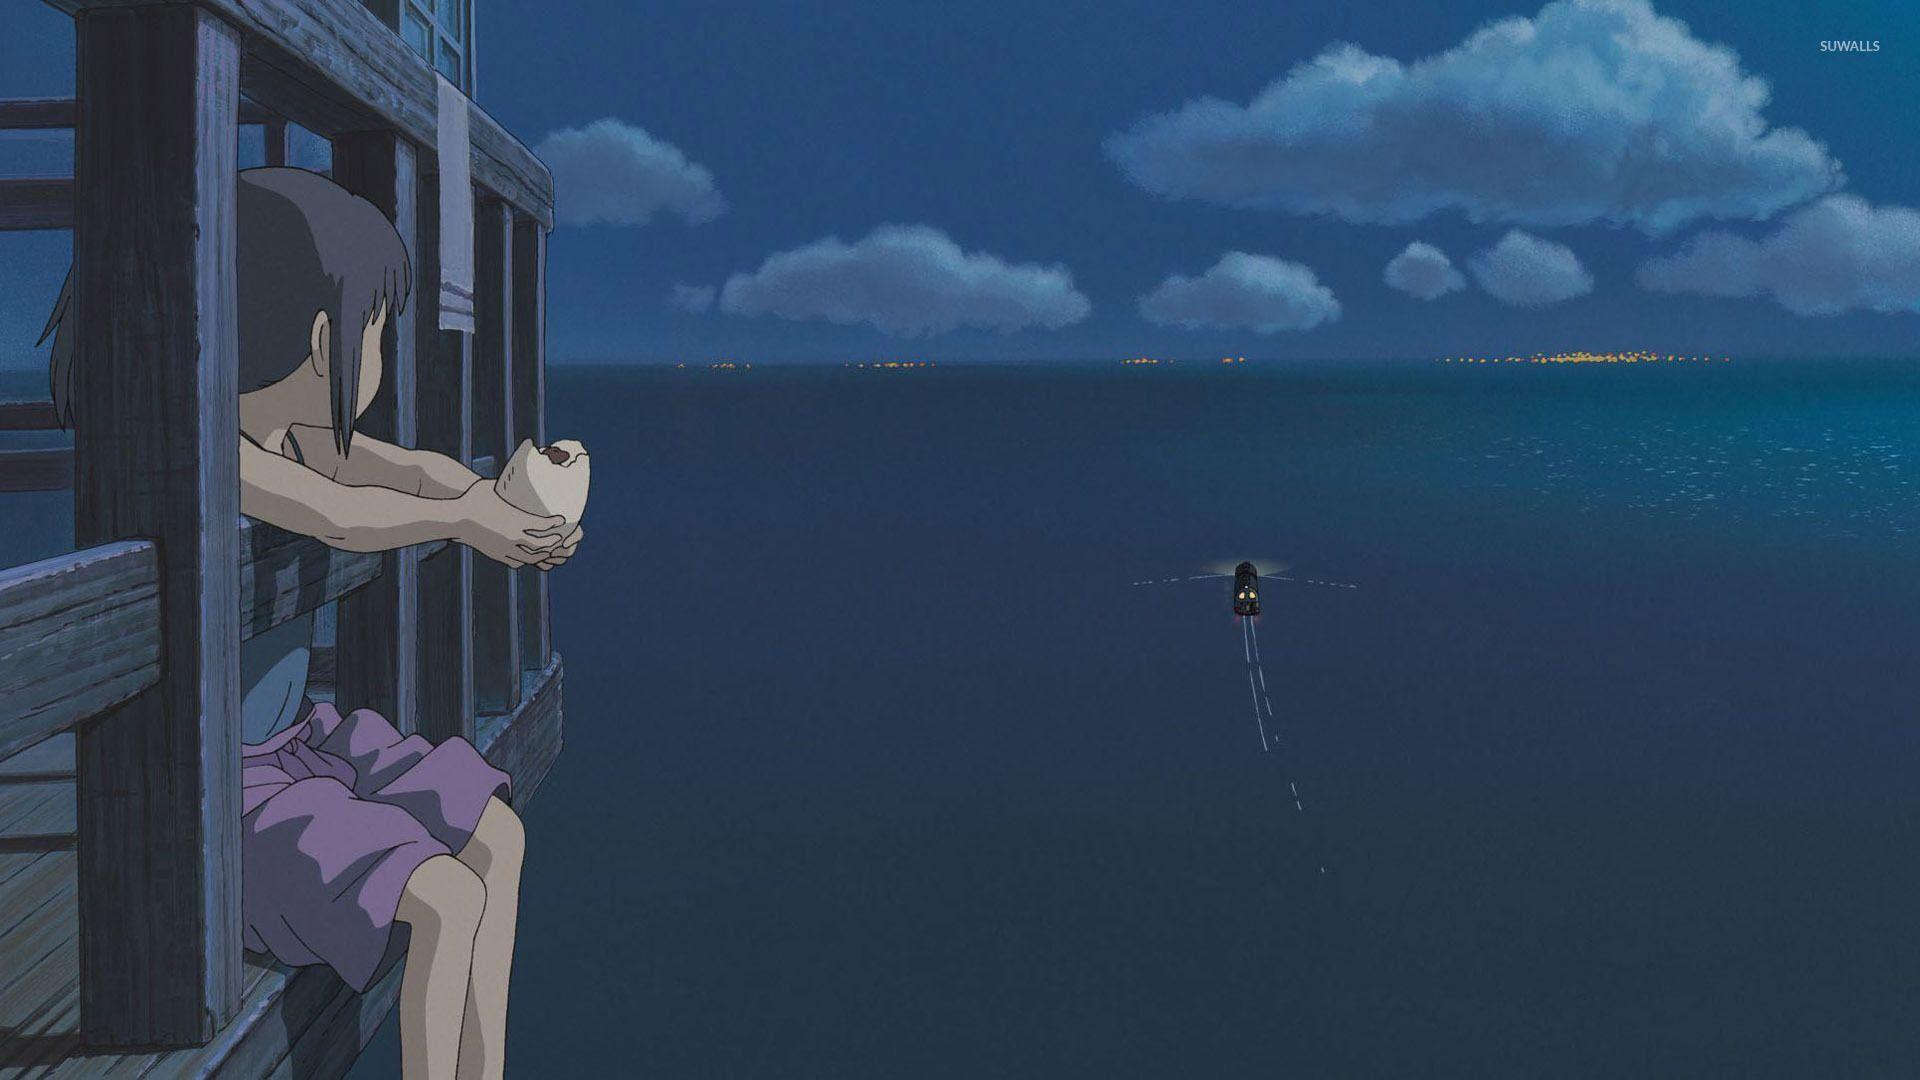 Screenshots From The Anime Spirited Away